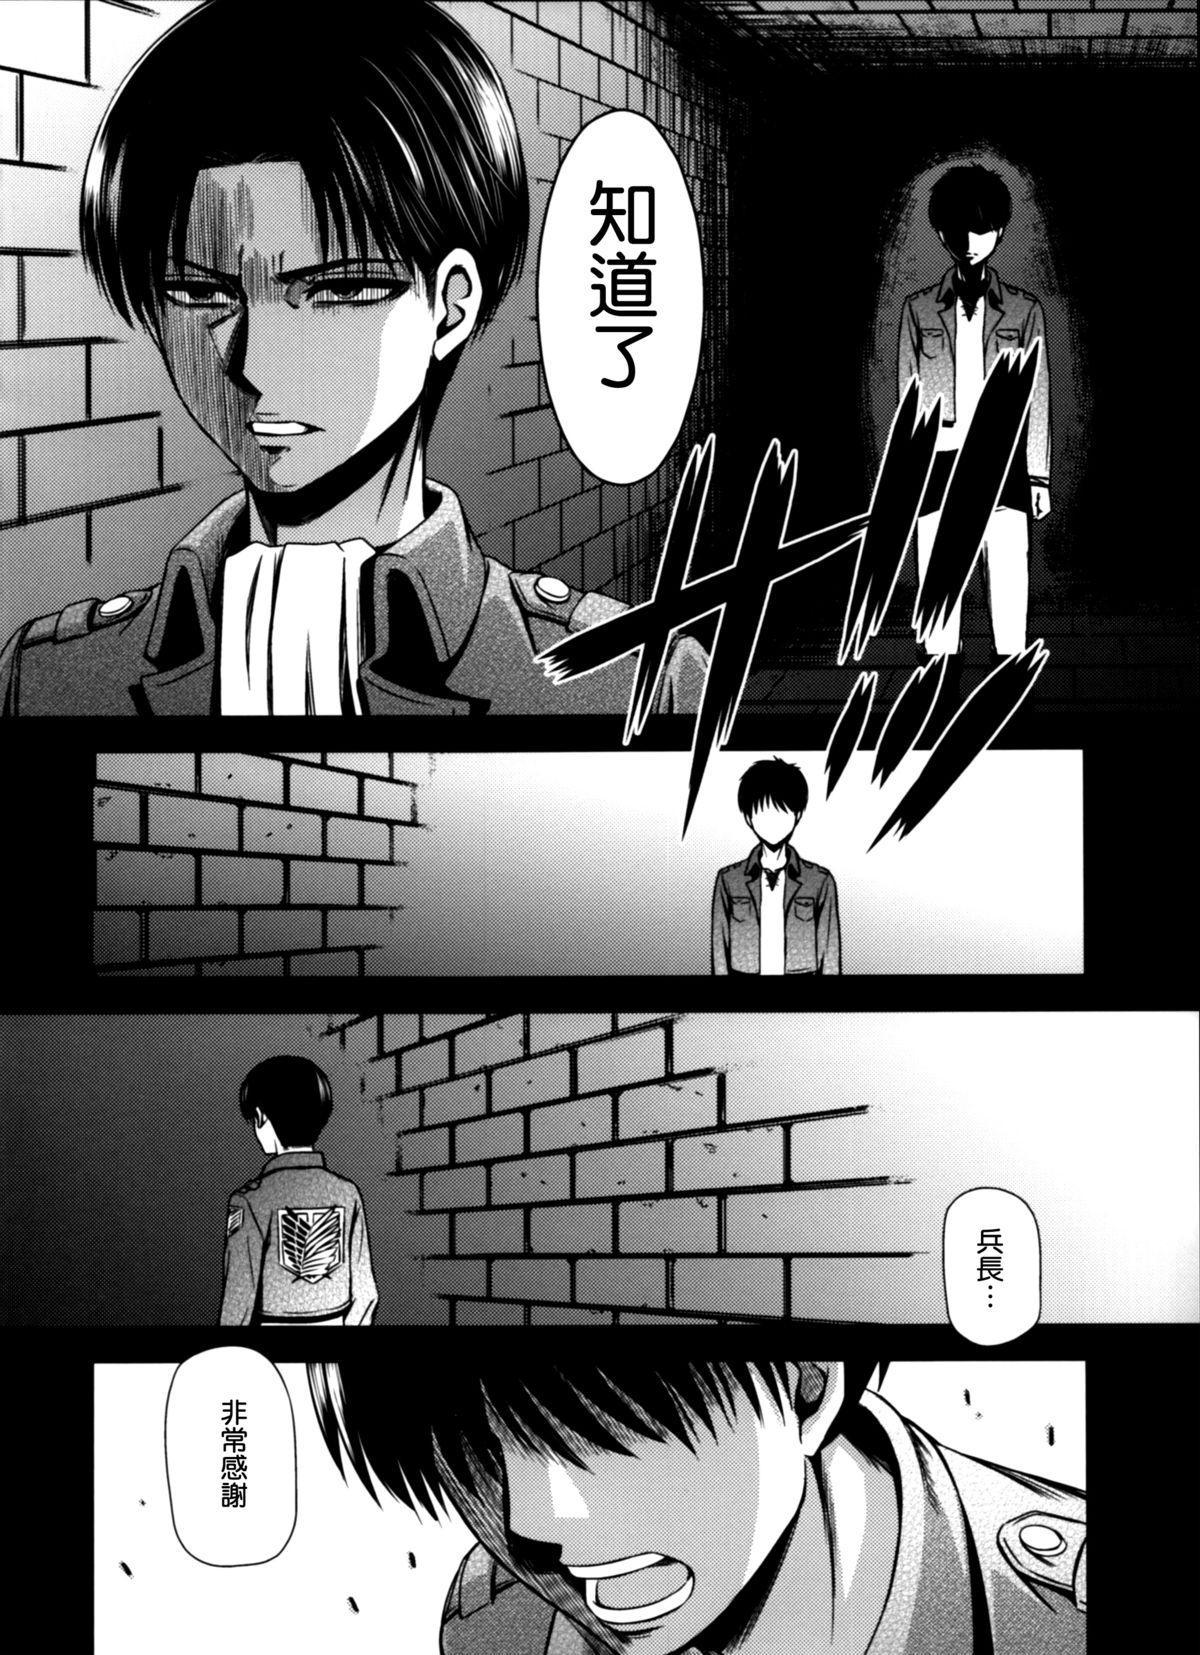 Gekishin Yon 40